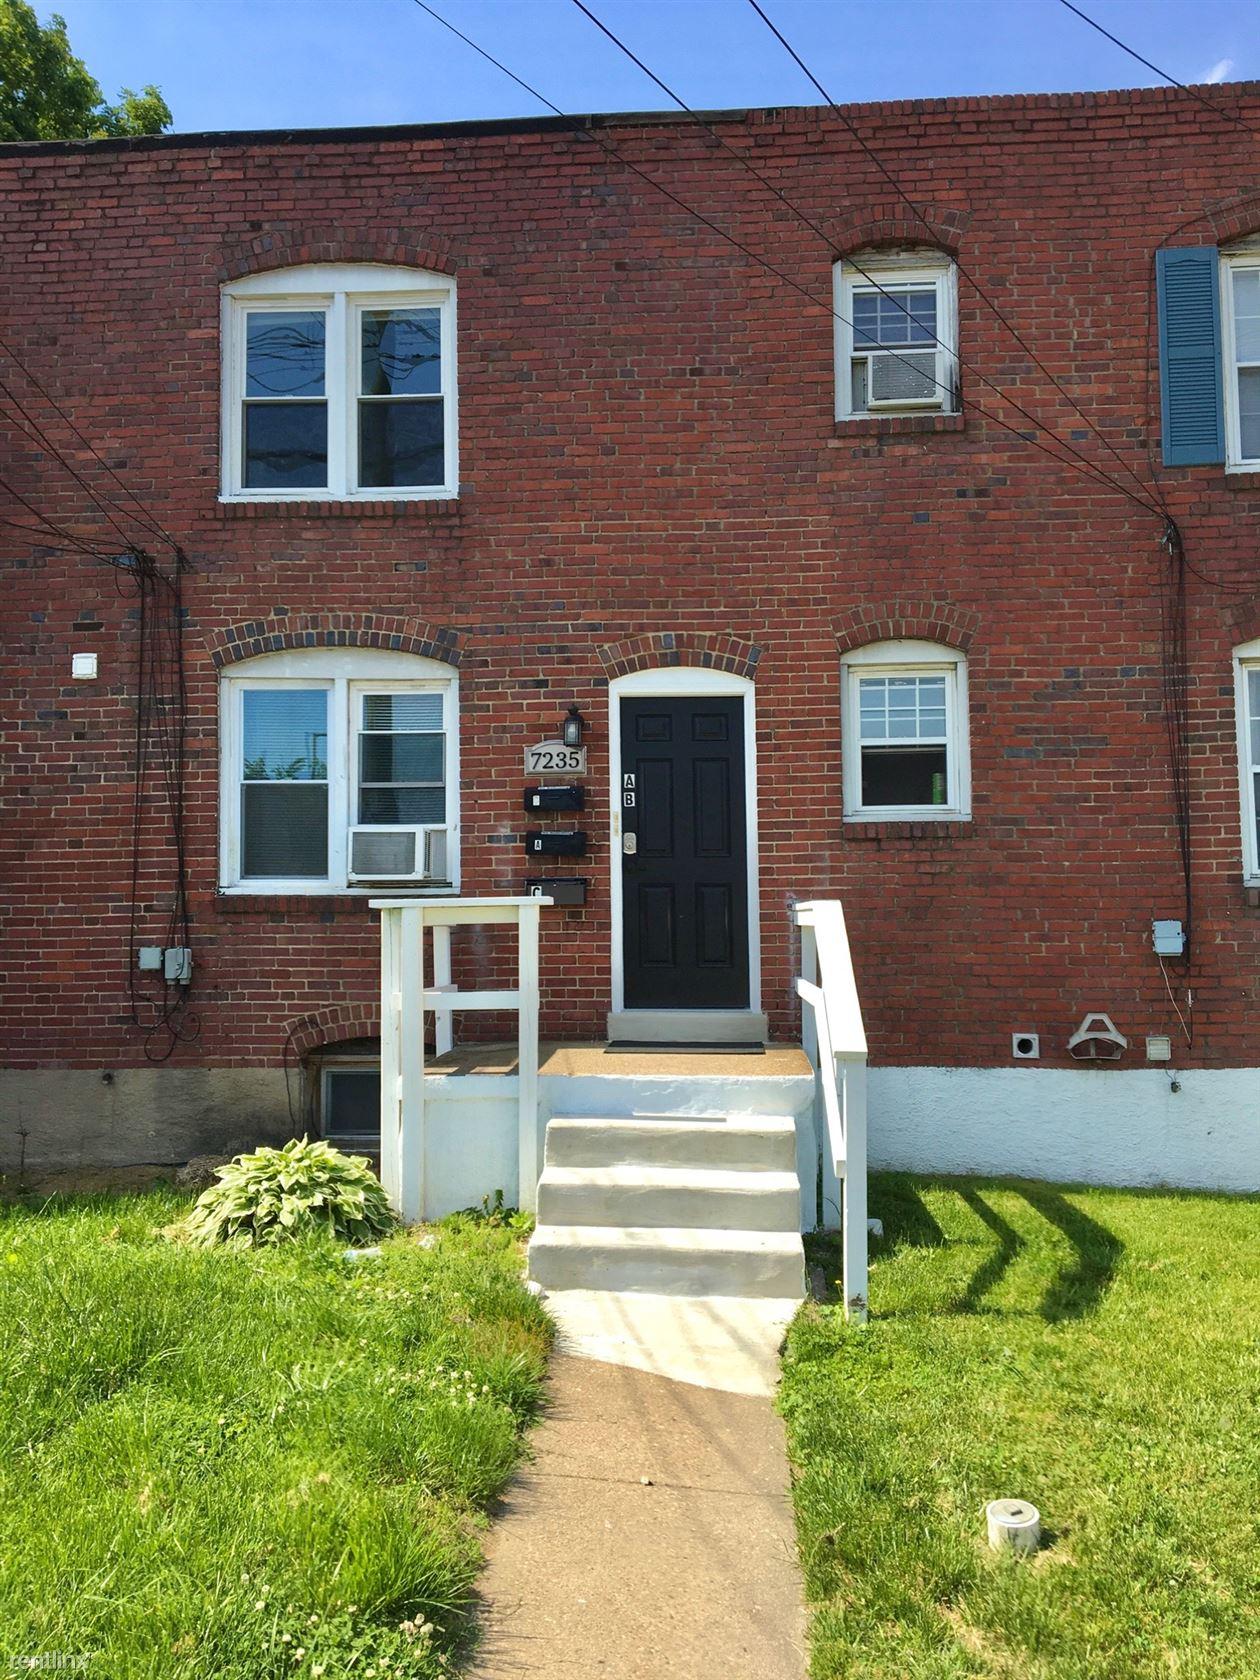 7235 Holabird Ave, Dundalk, MD - $1,000